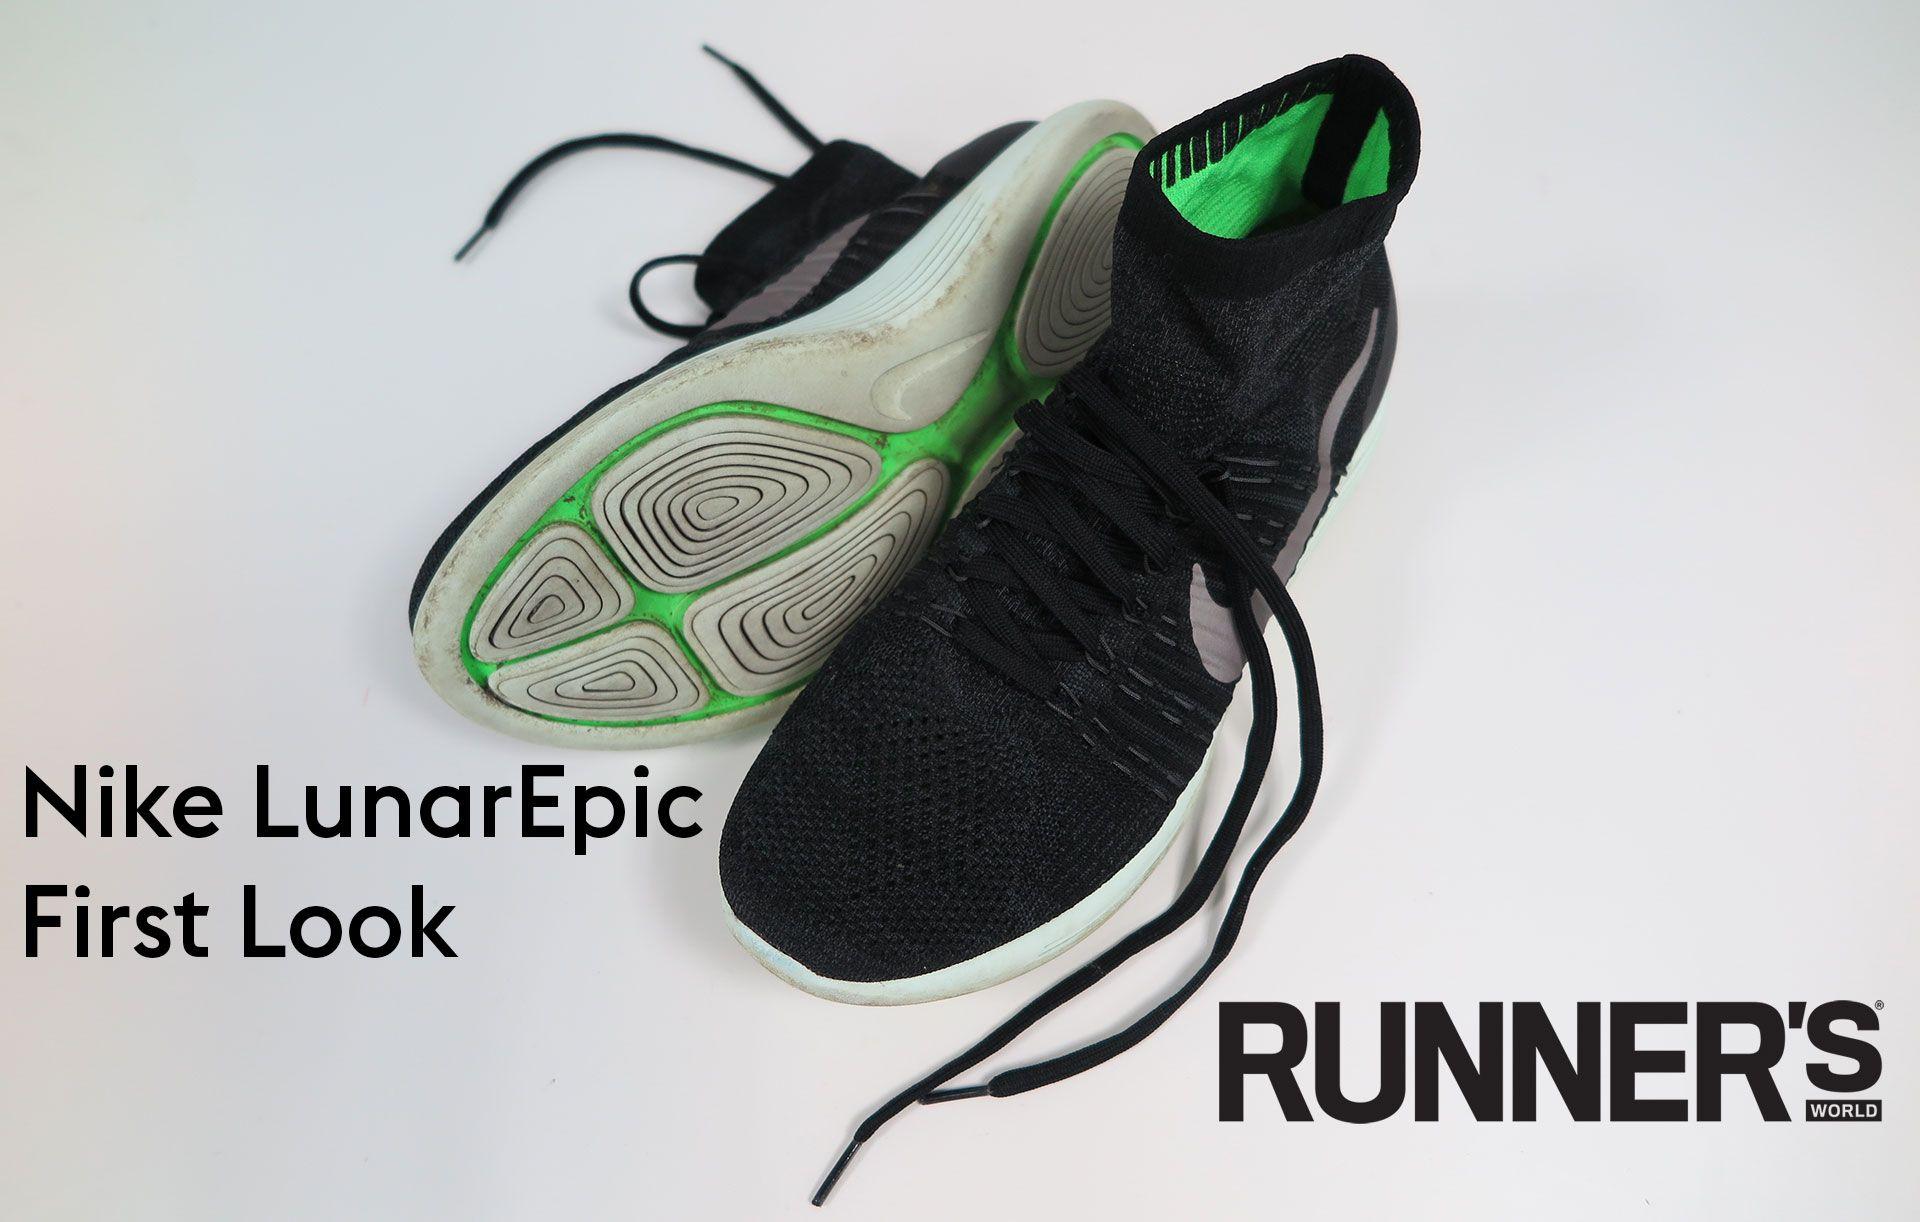 wholesale dealer d36bd 79a37 Shoe review  Nike LunarEpic exclusive first look